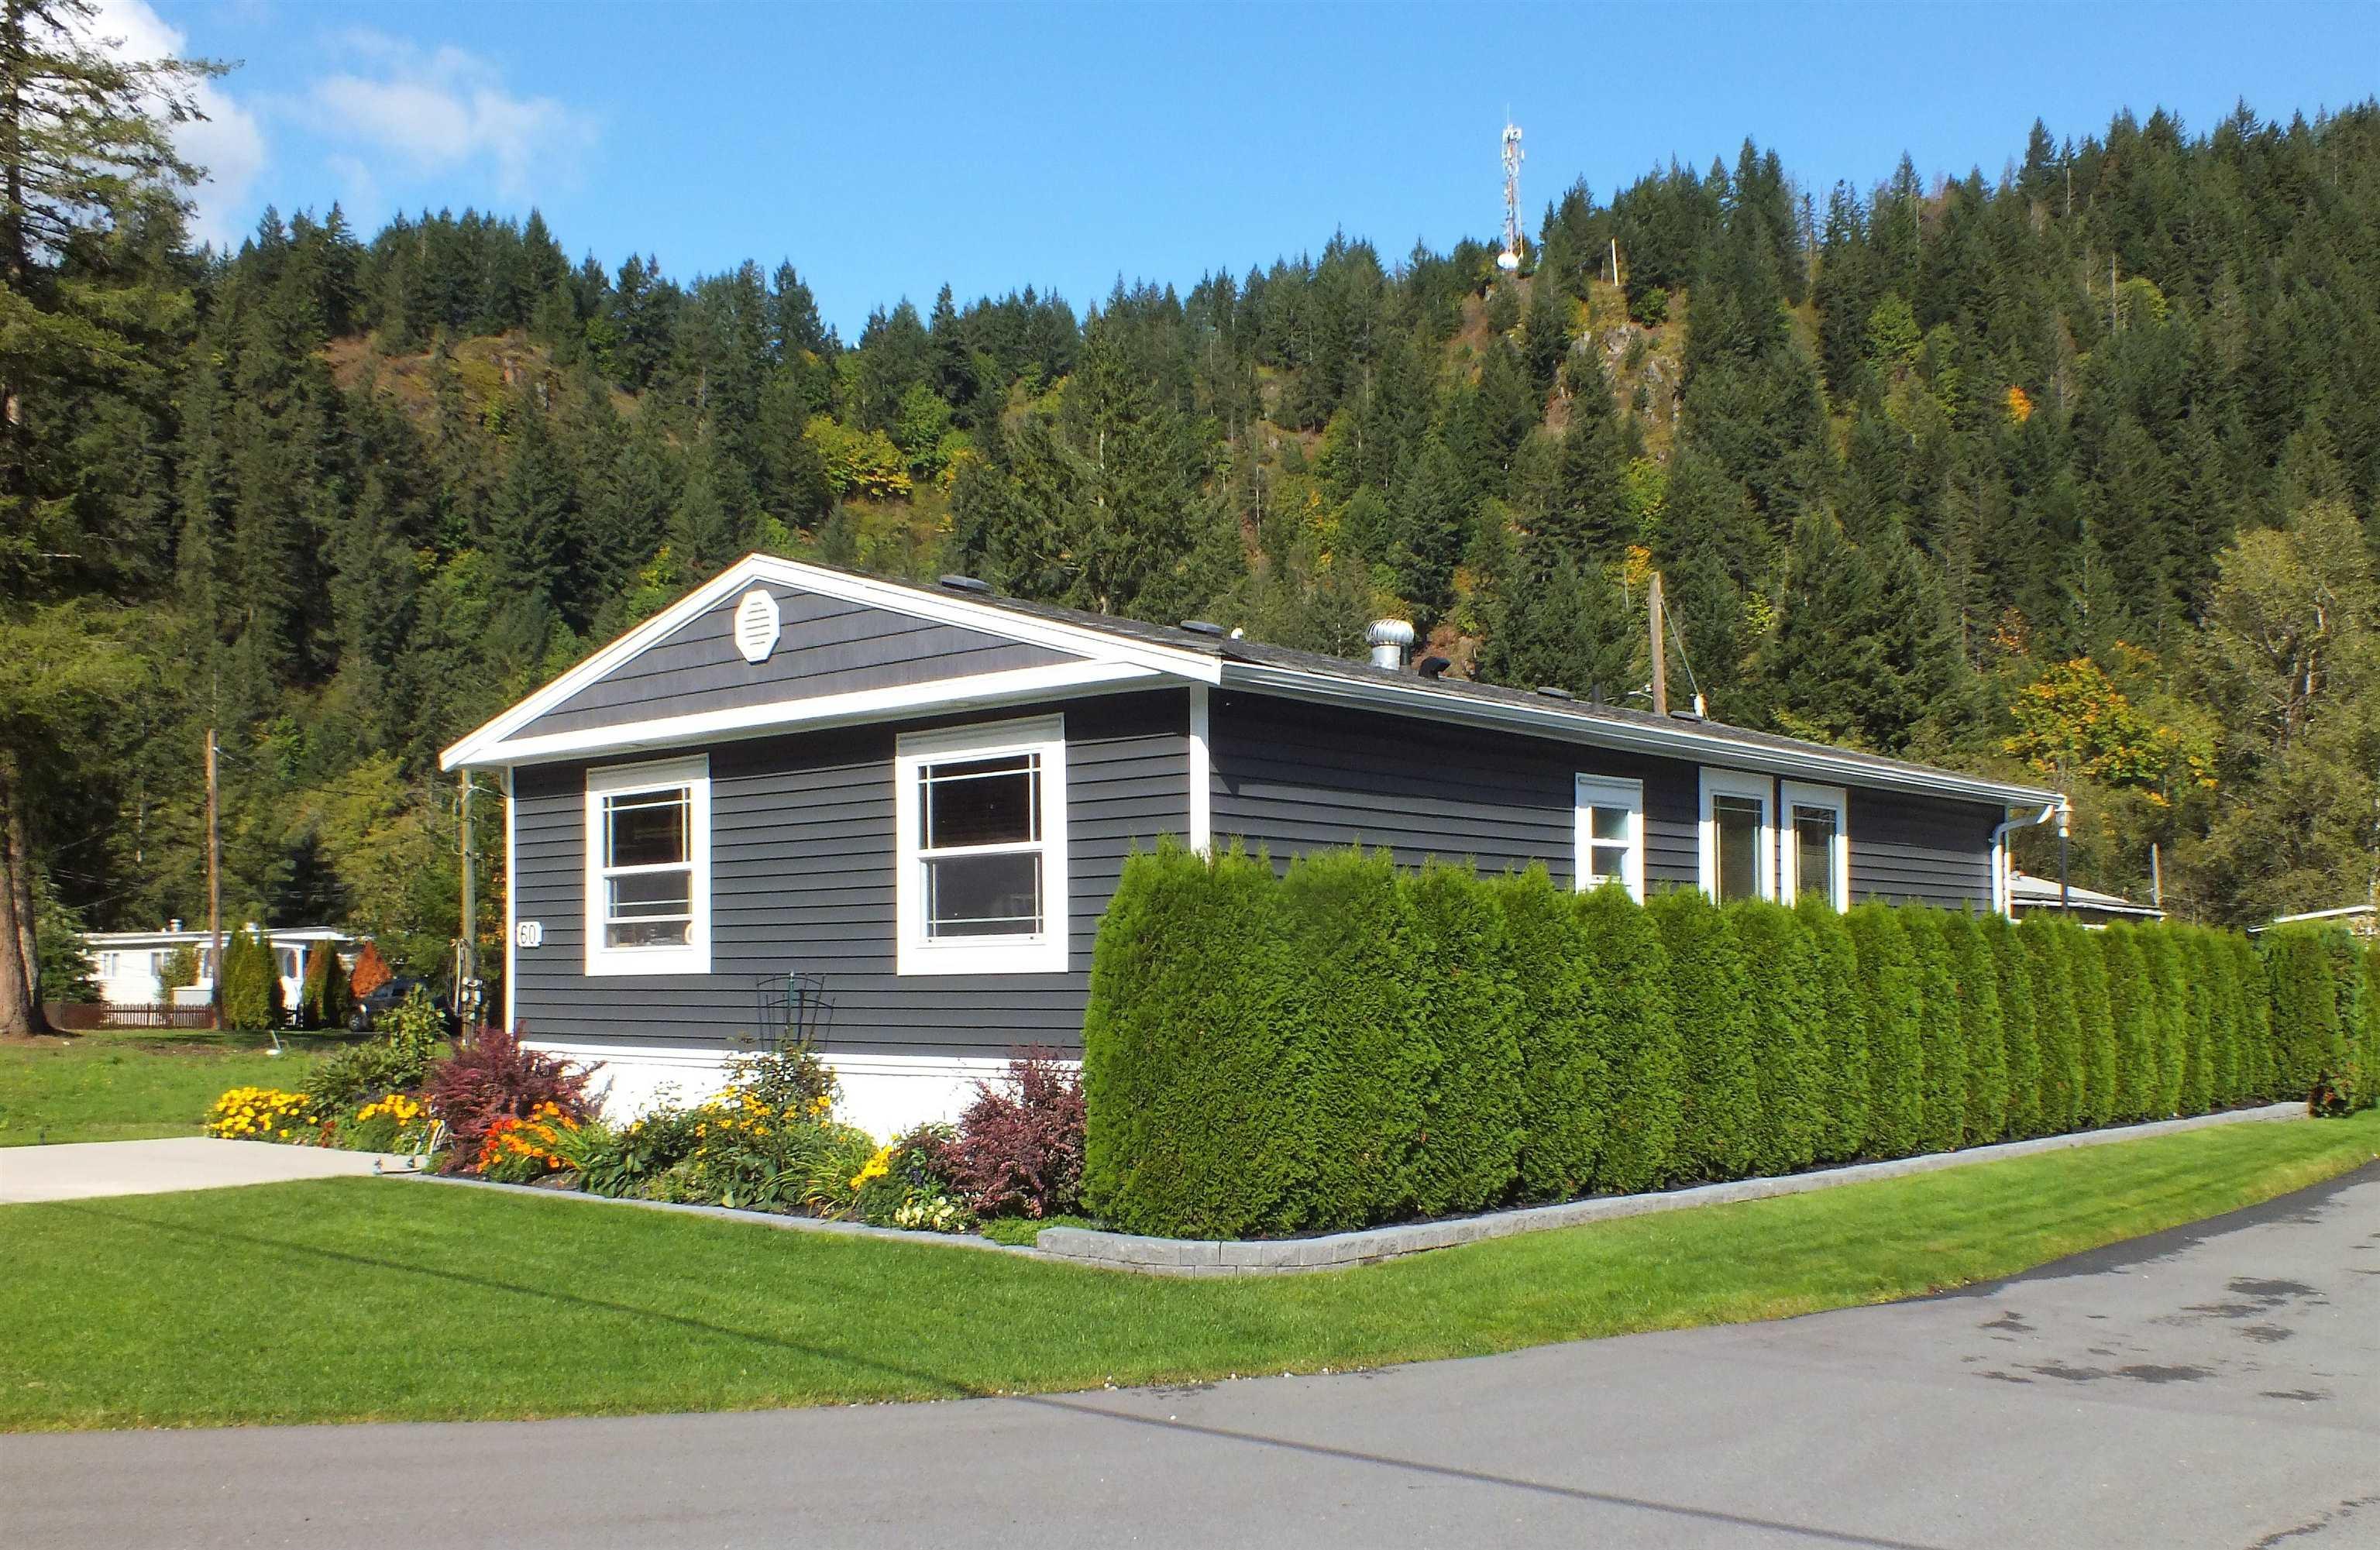 60 65367 KAWKAWA LAKE ROAD - Hope Kawkawa Lake Manufactured for sale, 2 Bedrooms (R2623976) - #1